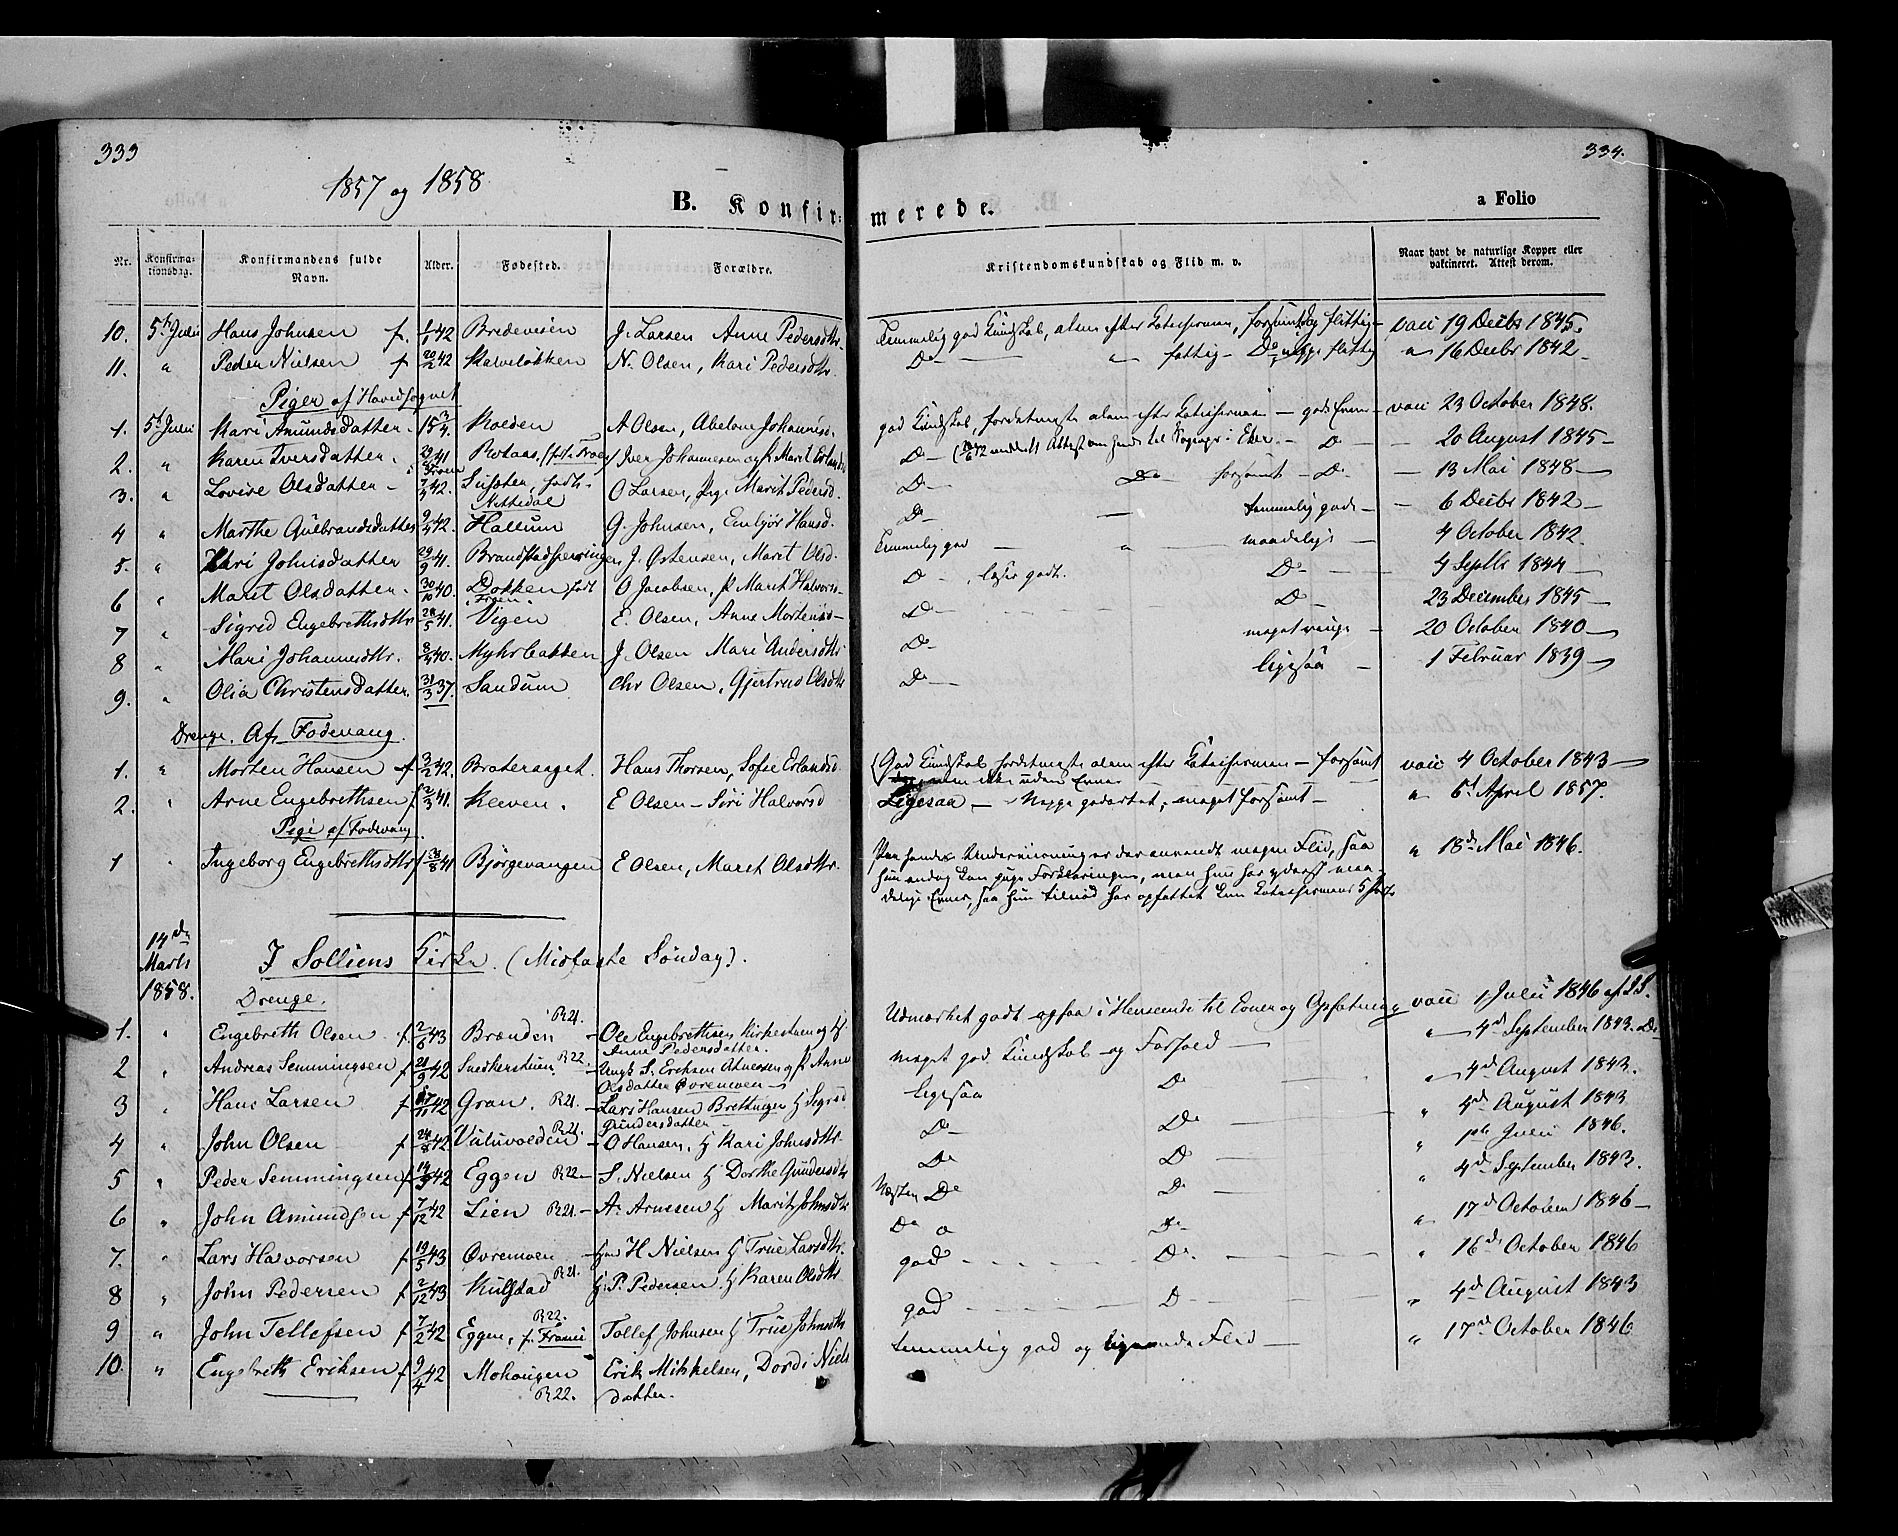 SAH, Ringebu prestekontor, Ministerialbok nr. 6, 1848-1859, s. 333-334